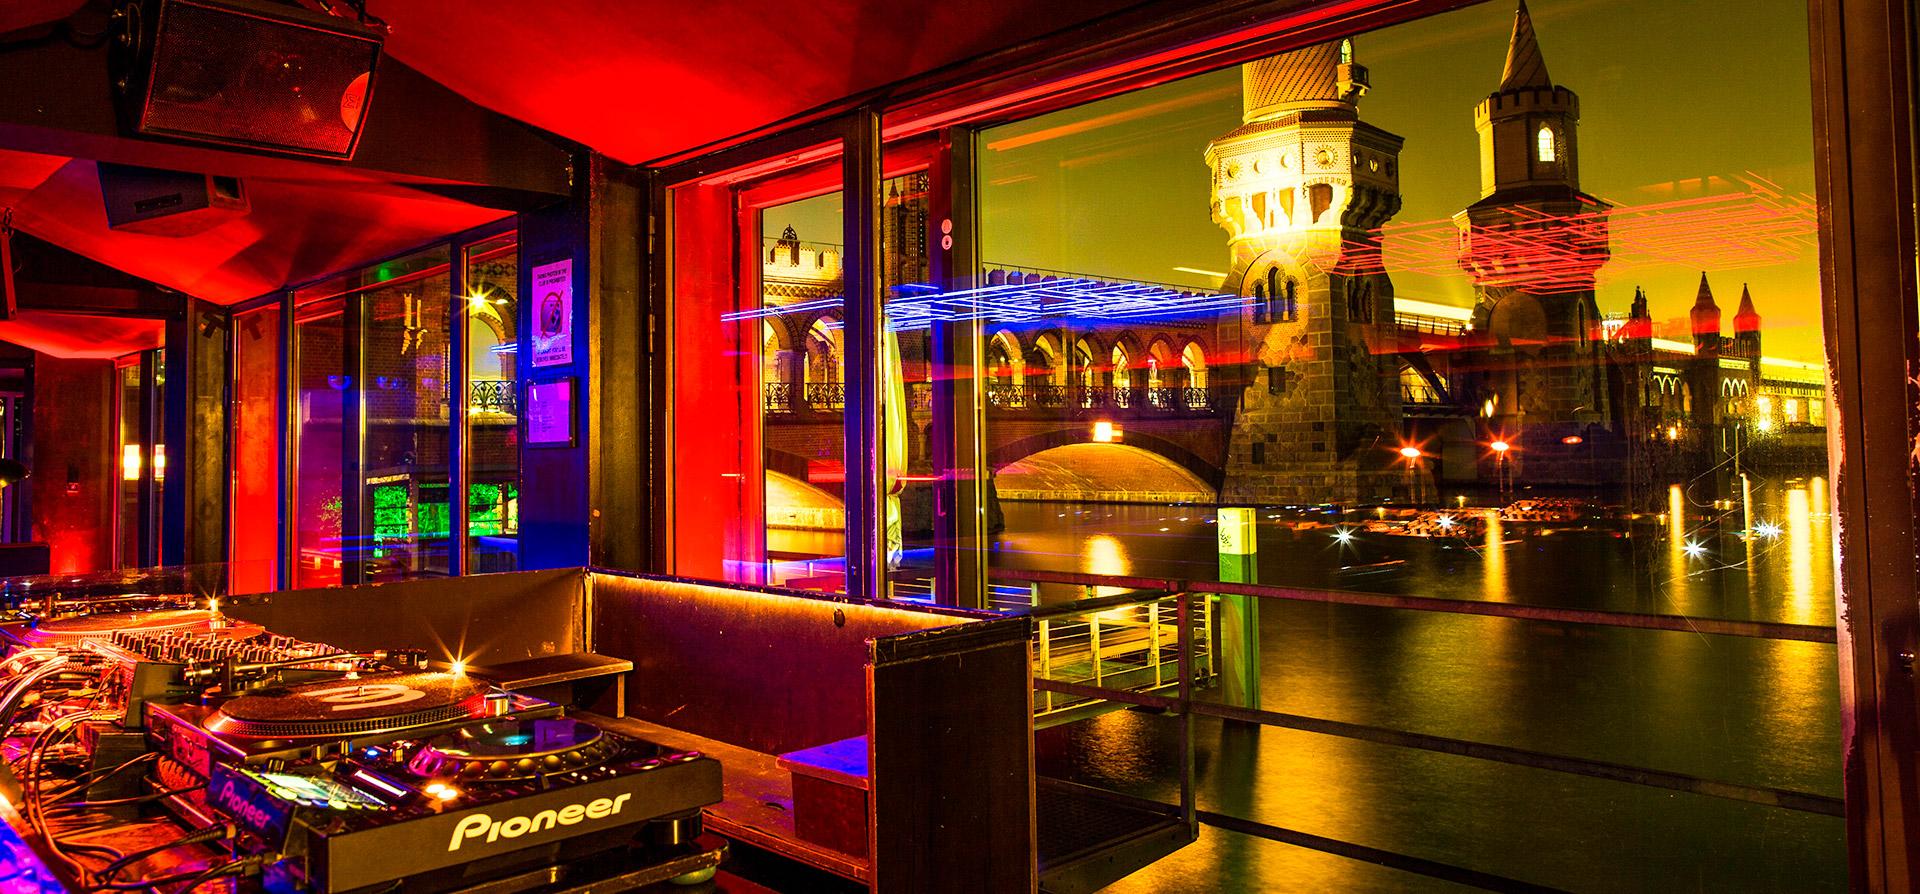 watergate launches virtual club night